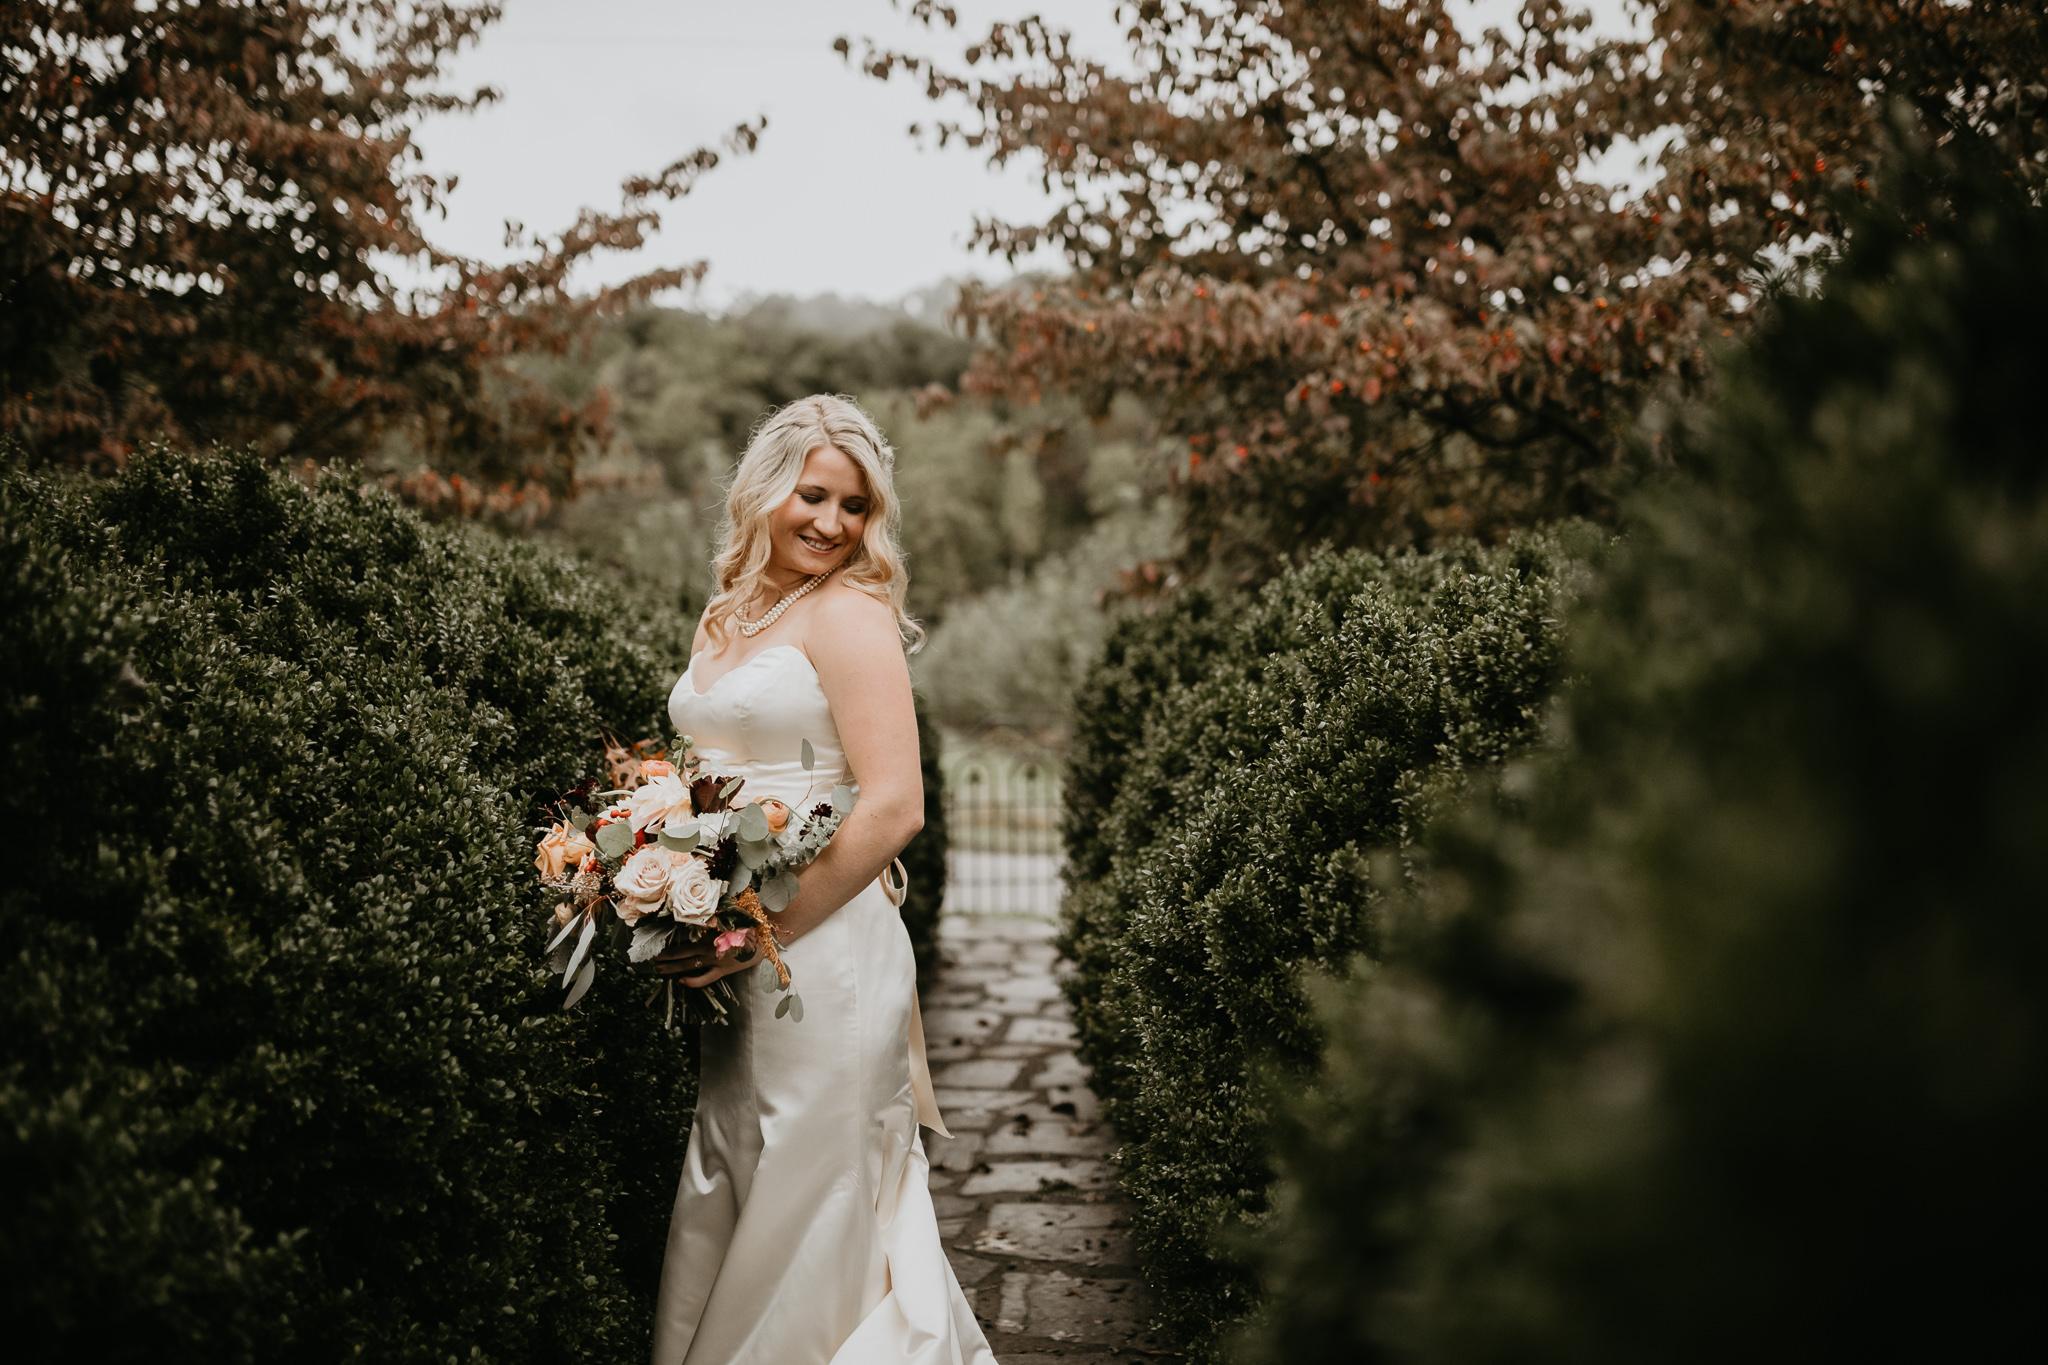 Sundara - Weddings - Virginia - Best Wedding Photographer - Pat Cori Photography-34.jpg